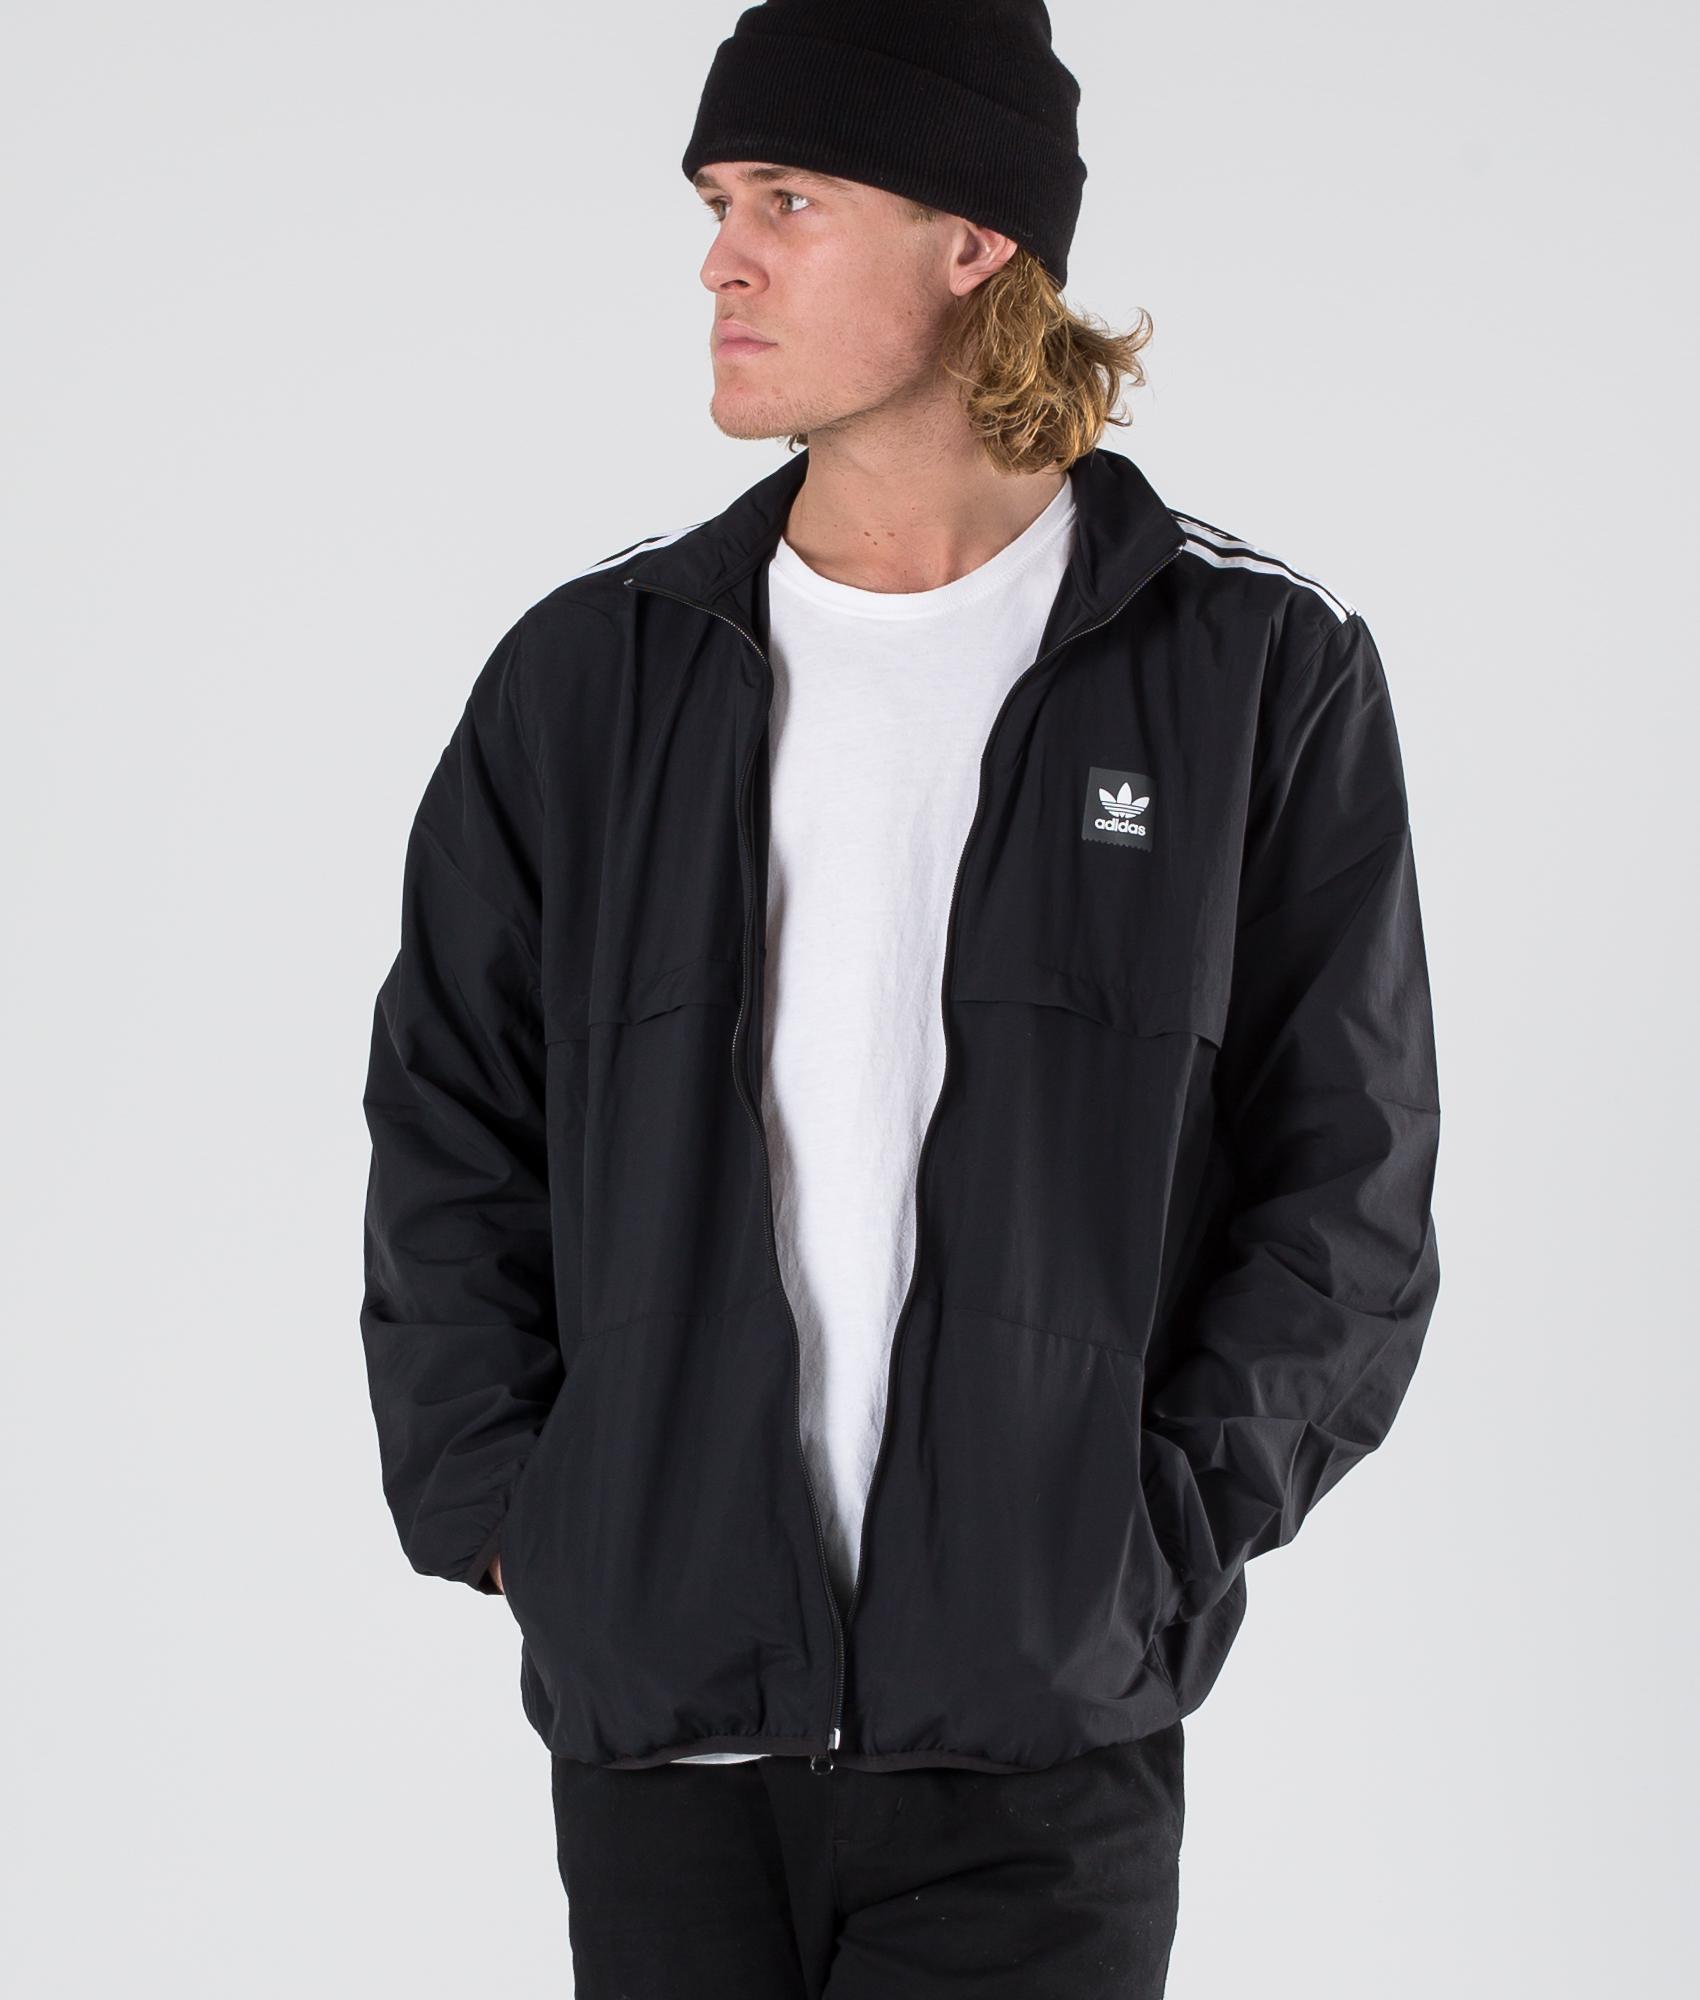 Spedizione Giacche Ridestore Gratuita Streetwear Uomo qqw8ERUx